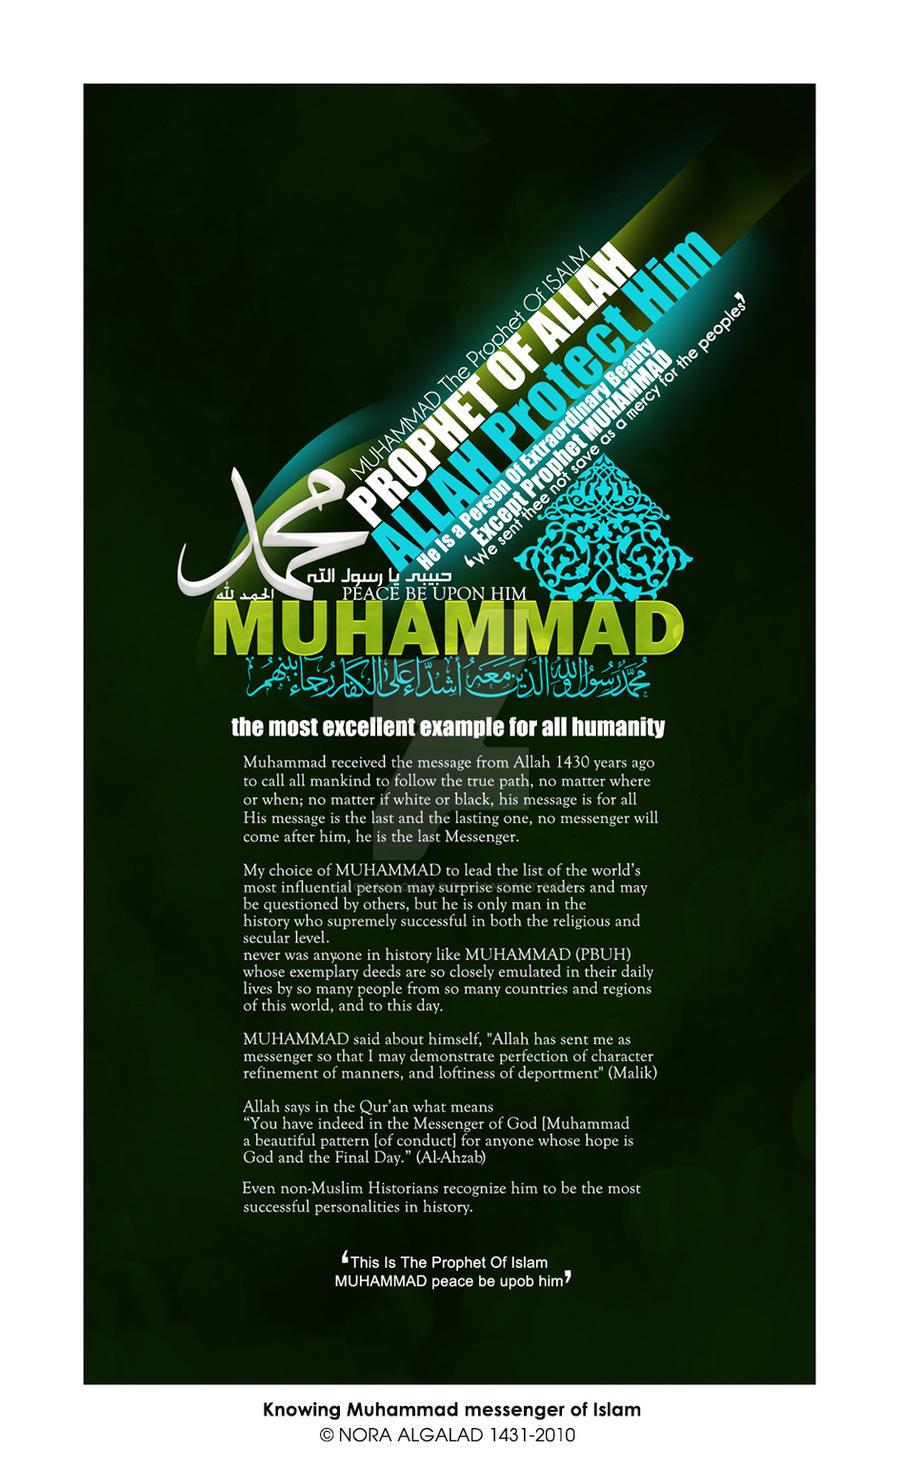 MUHAMMAD prophet of Islam by NoraAlgalad